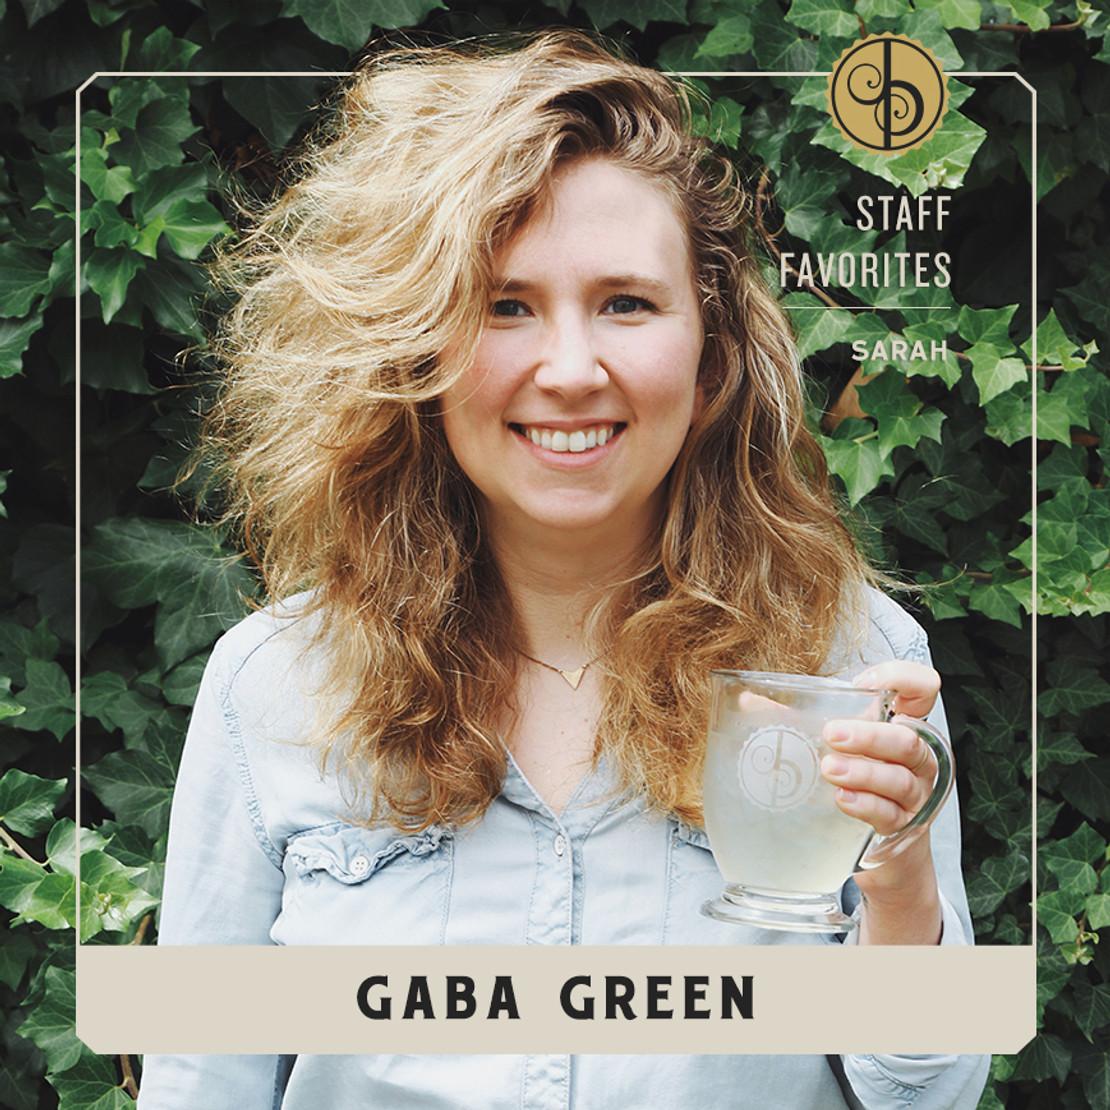 Staff Favorites: Sarah and GABA Green